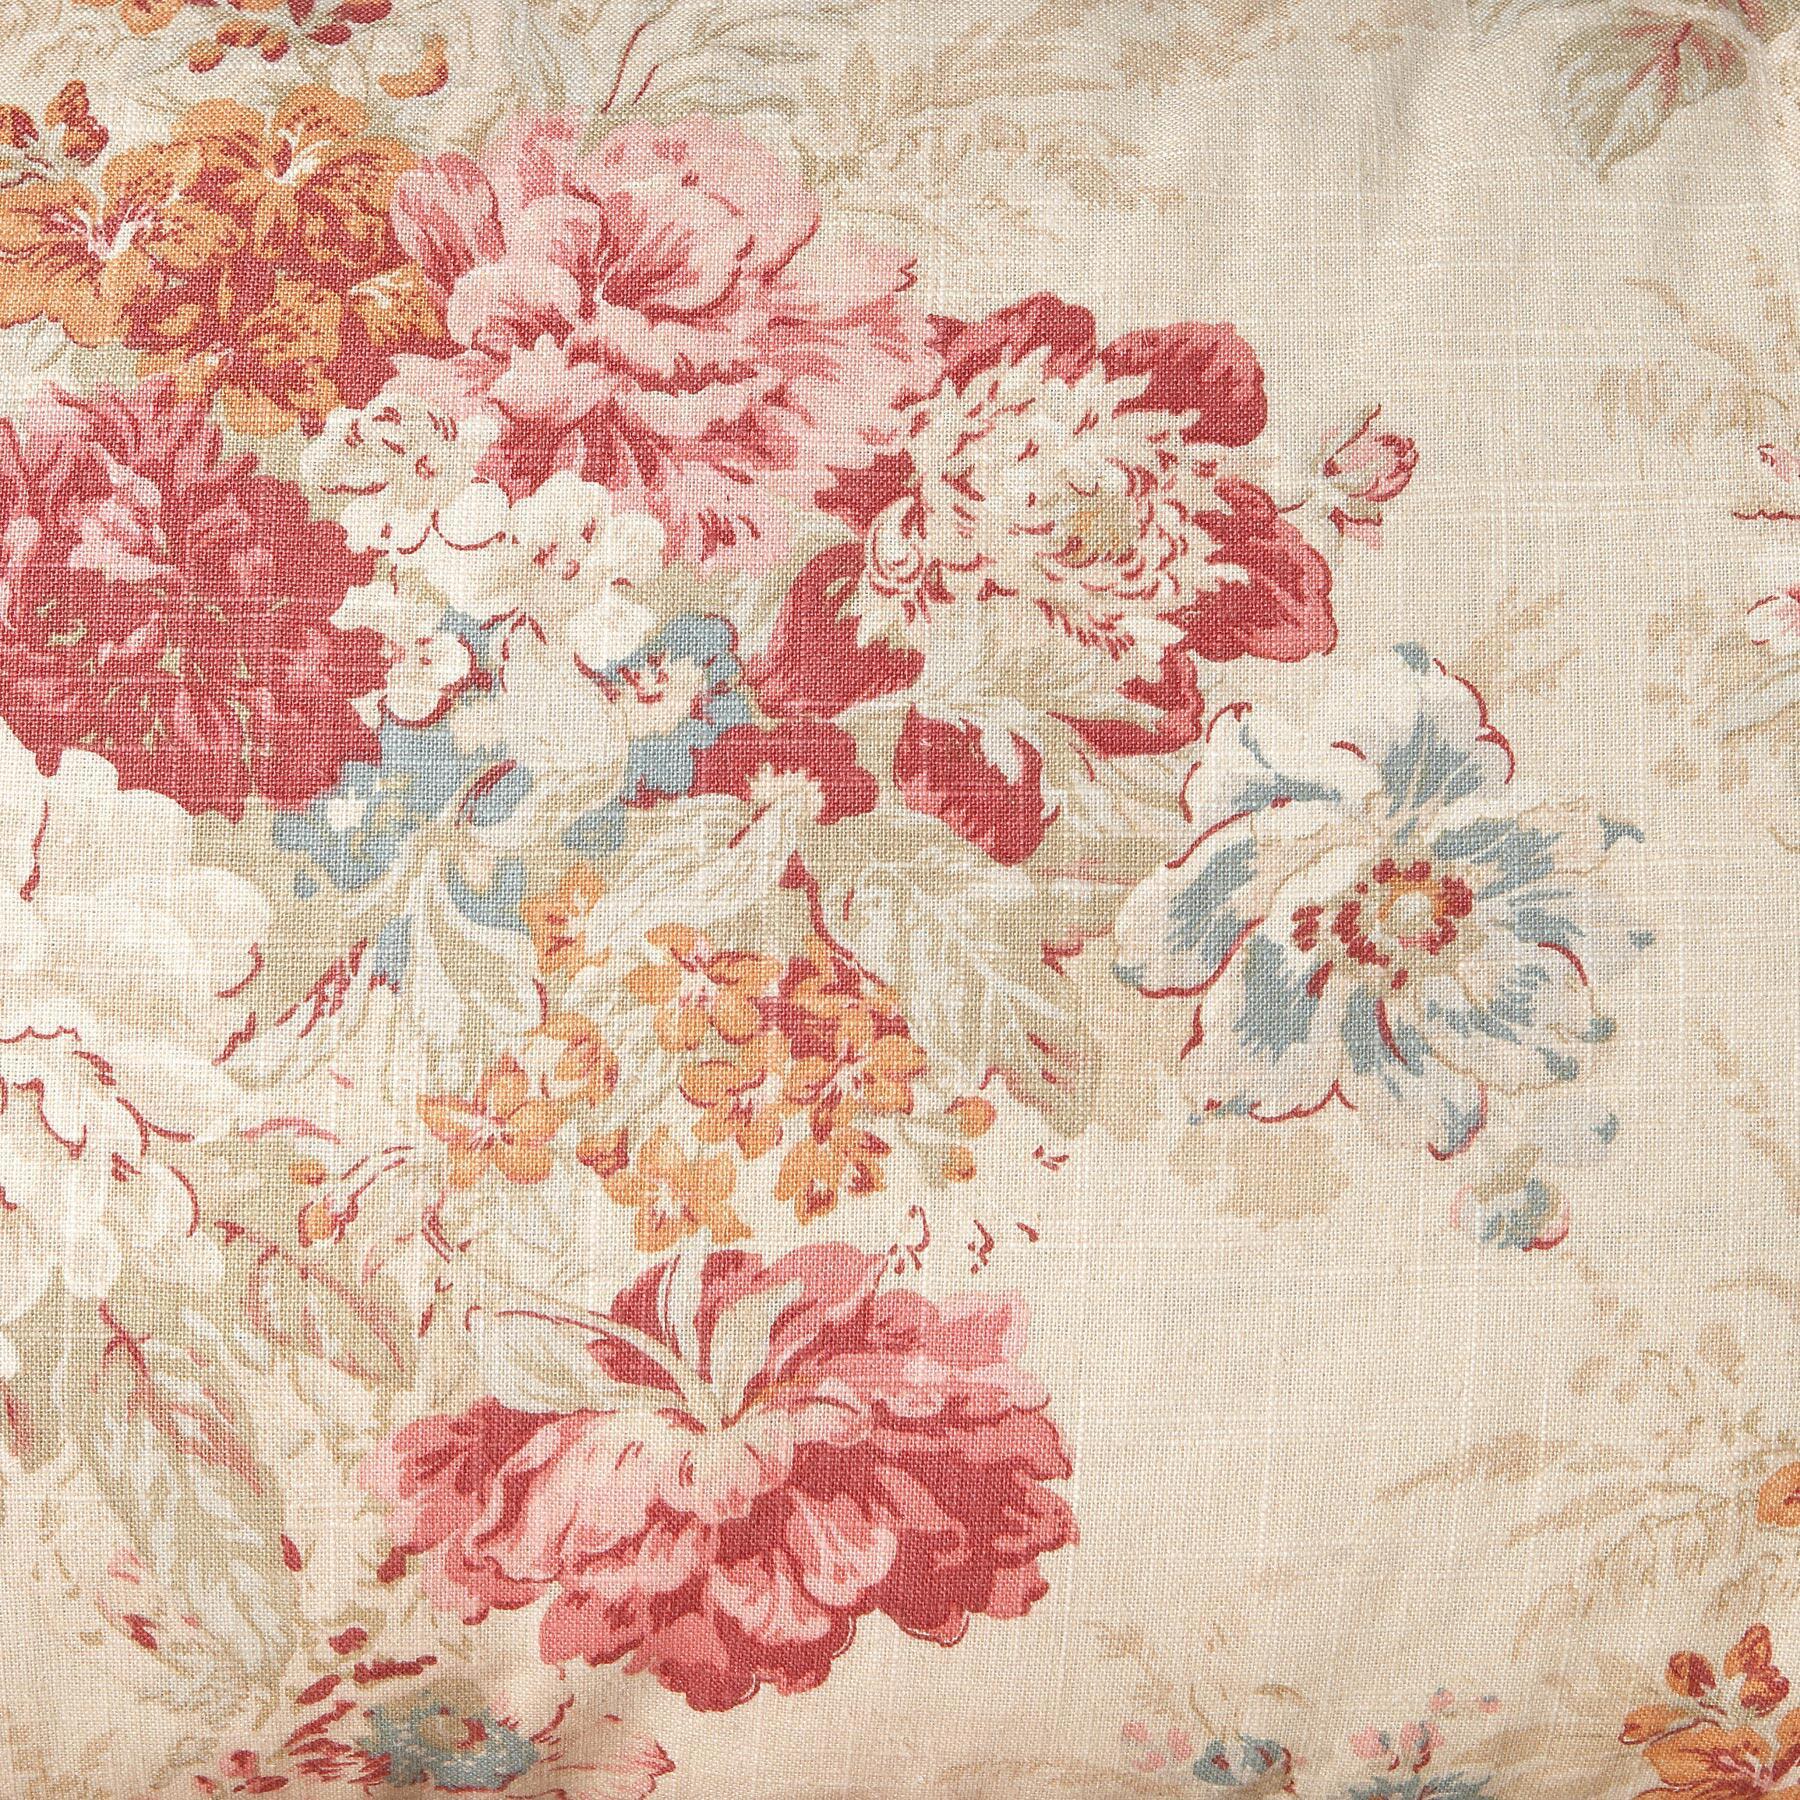 Vintage Floral Sofa Robert Redford S Sundance Catalog